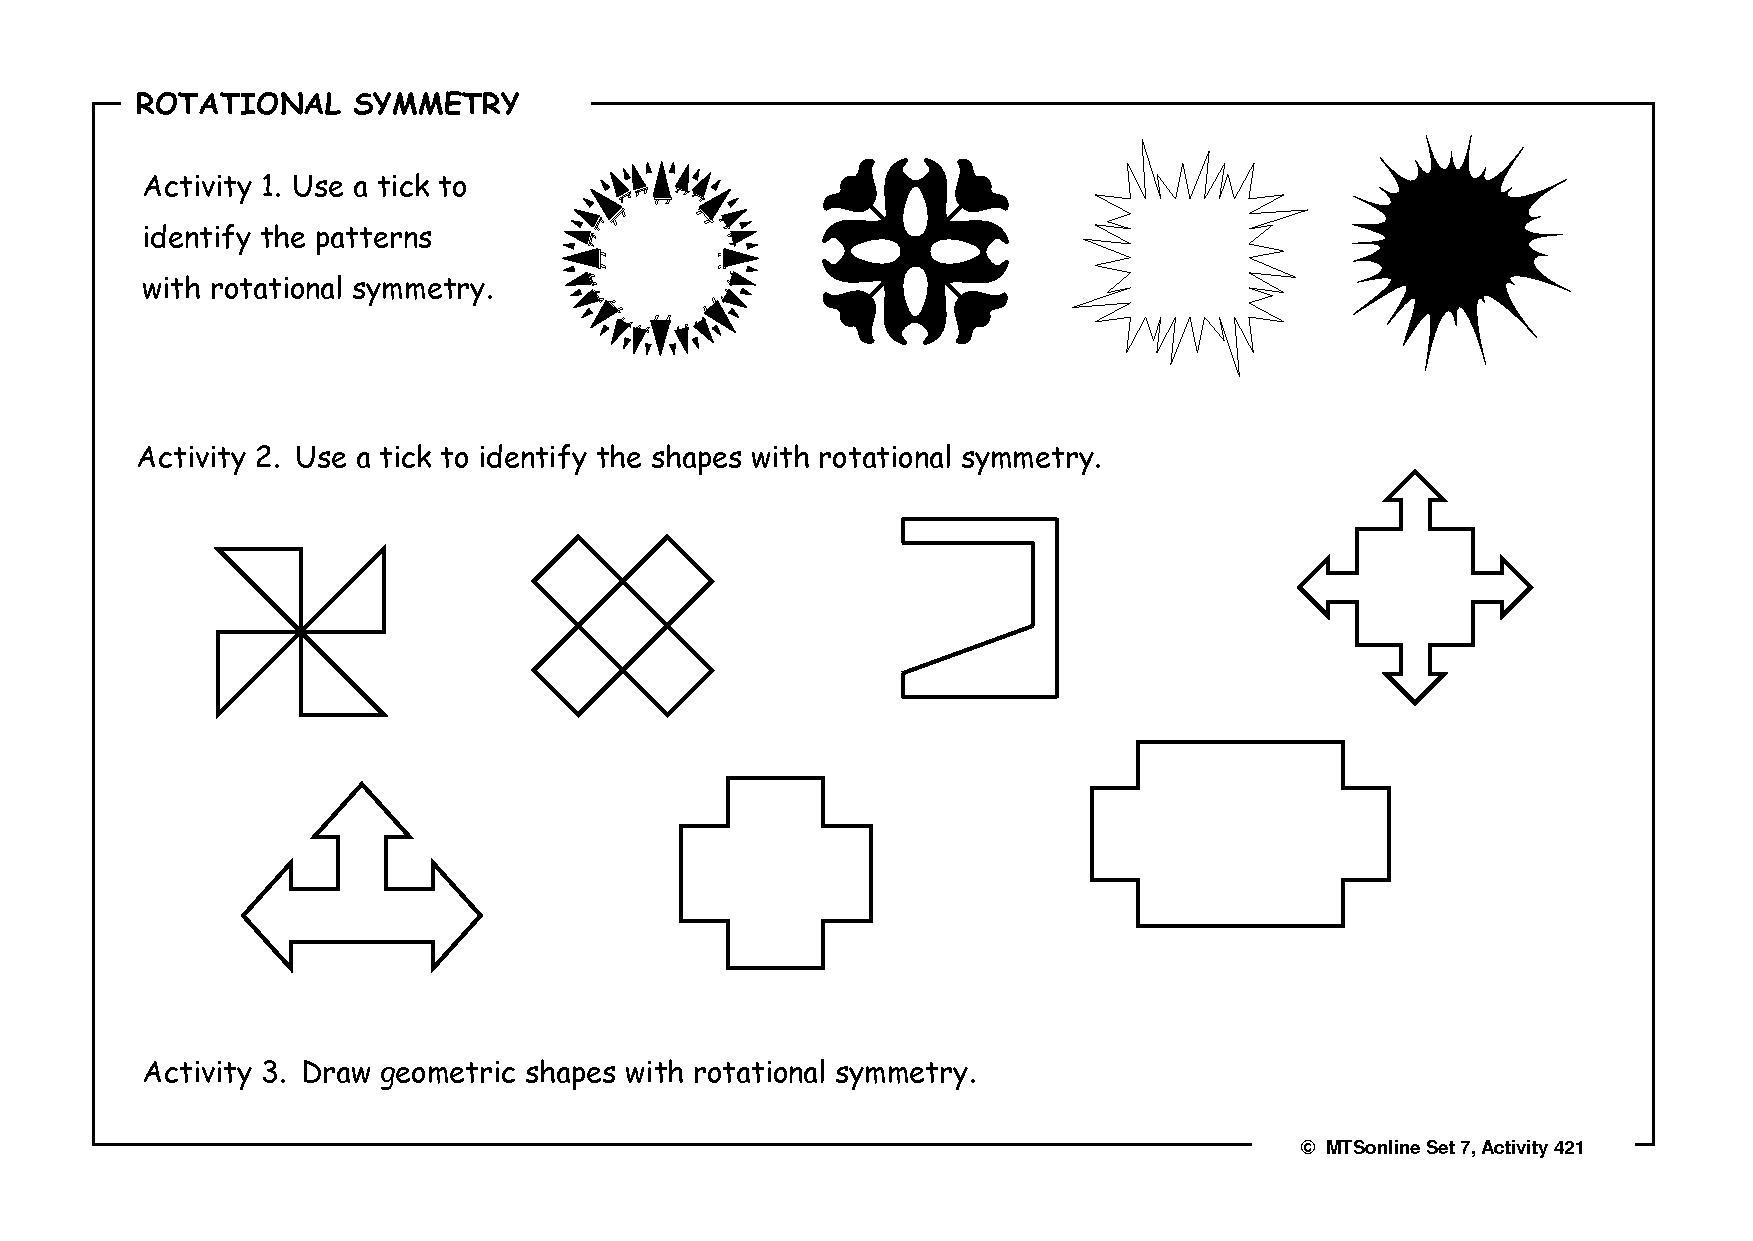 421rotational_symmetry0001